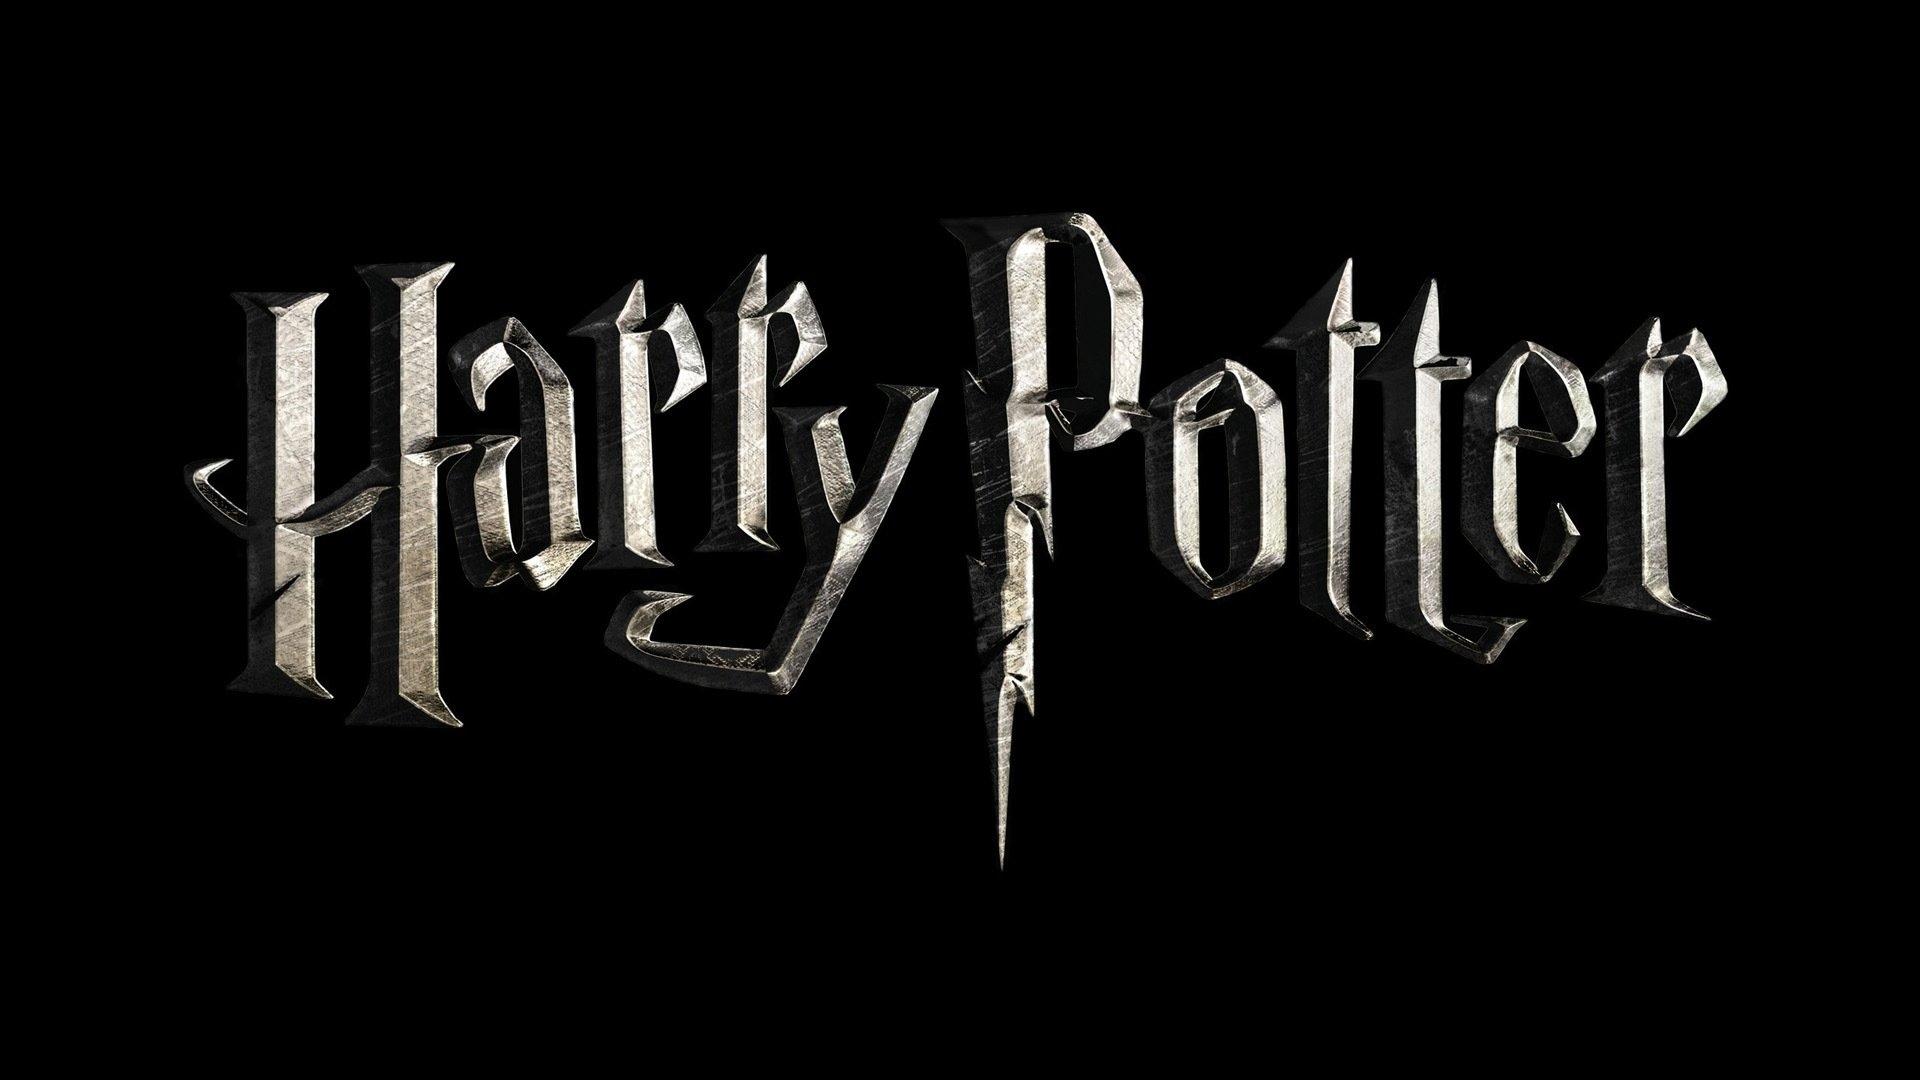 harry potter logo wallpaper harry potter widescreen gold logo